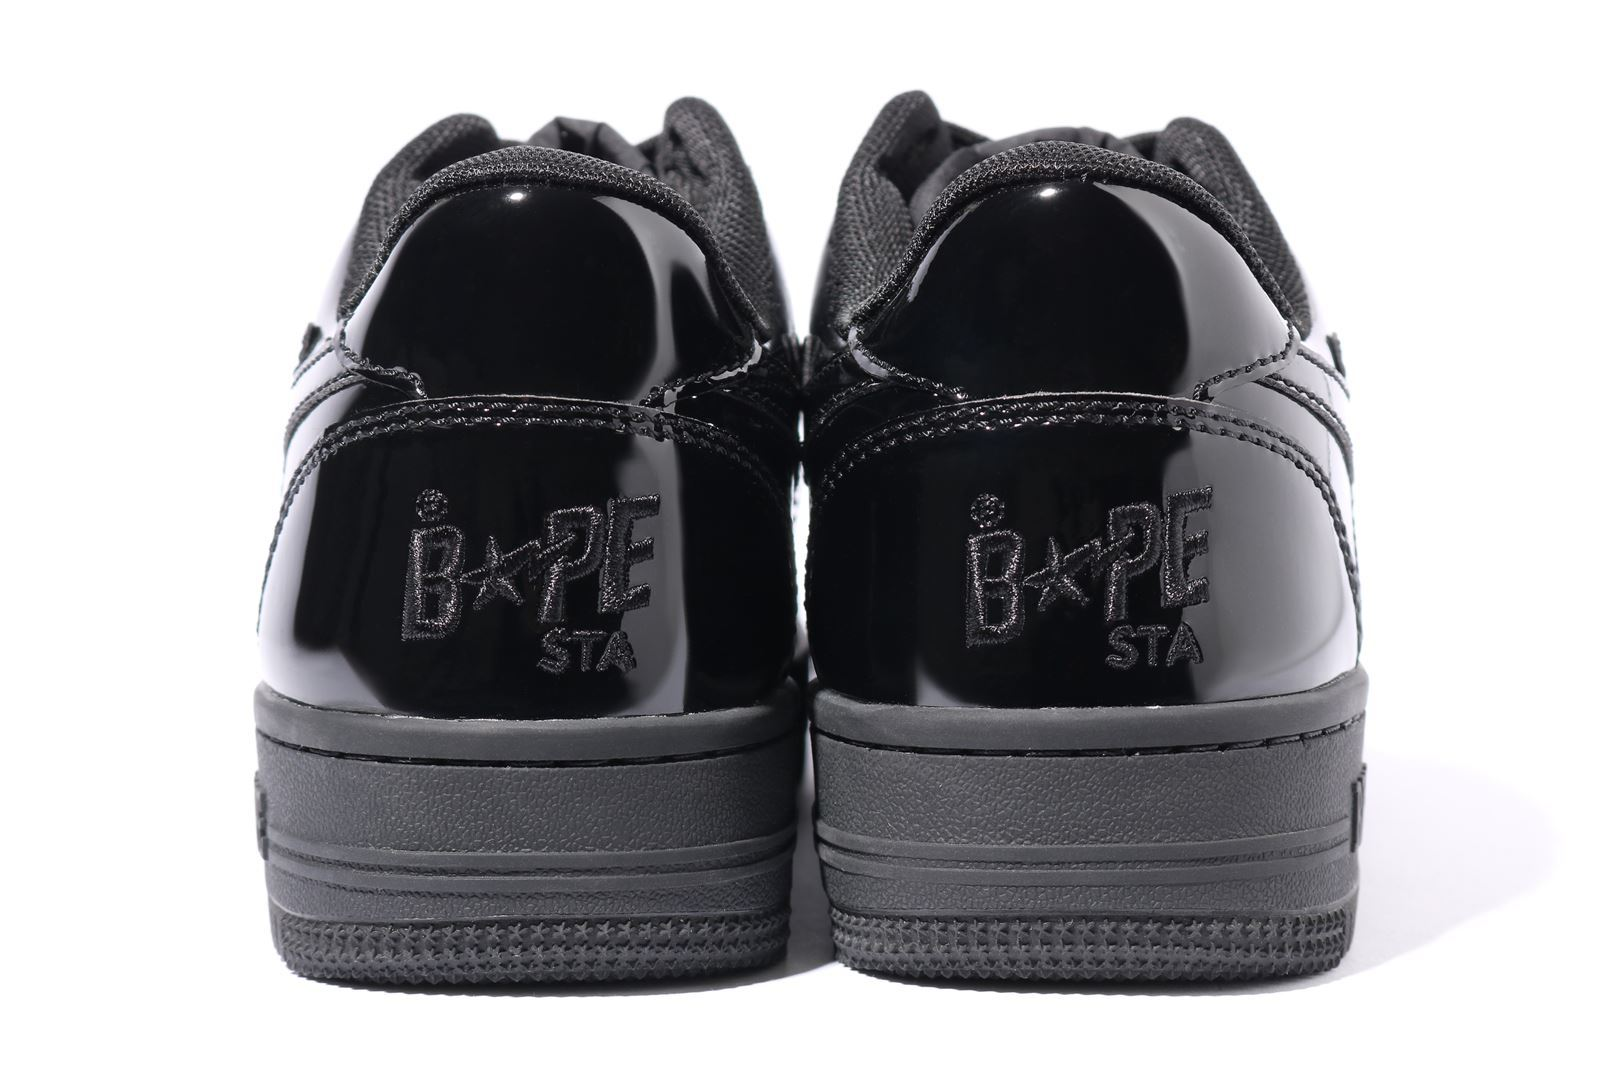 BAPE STA™ LOW_a0174495_16295567.jpg